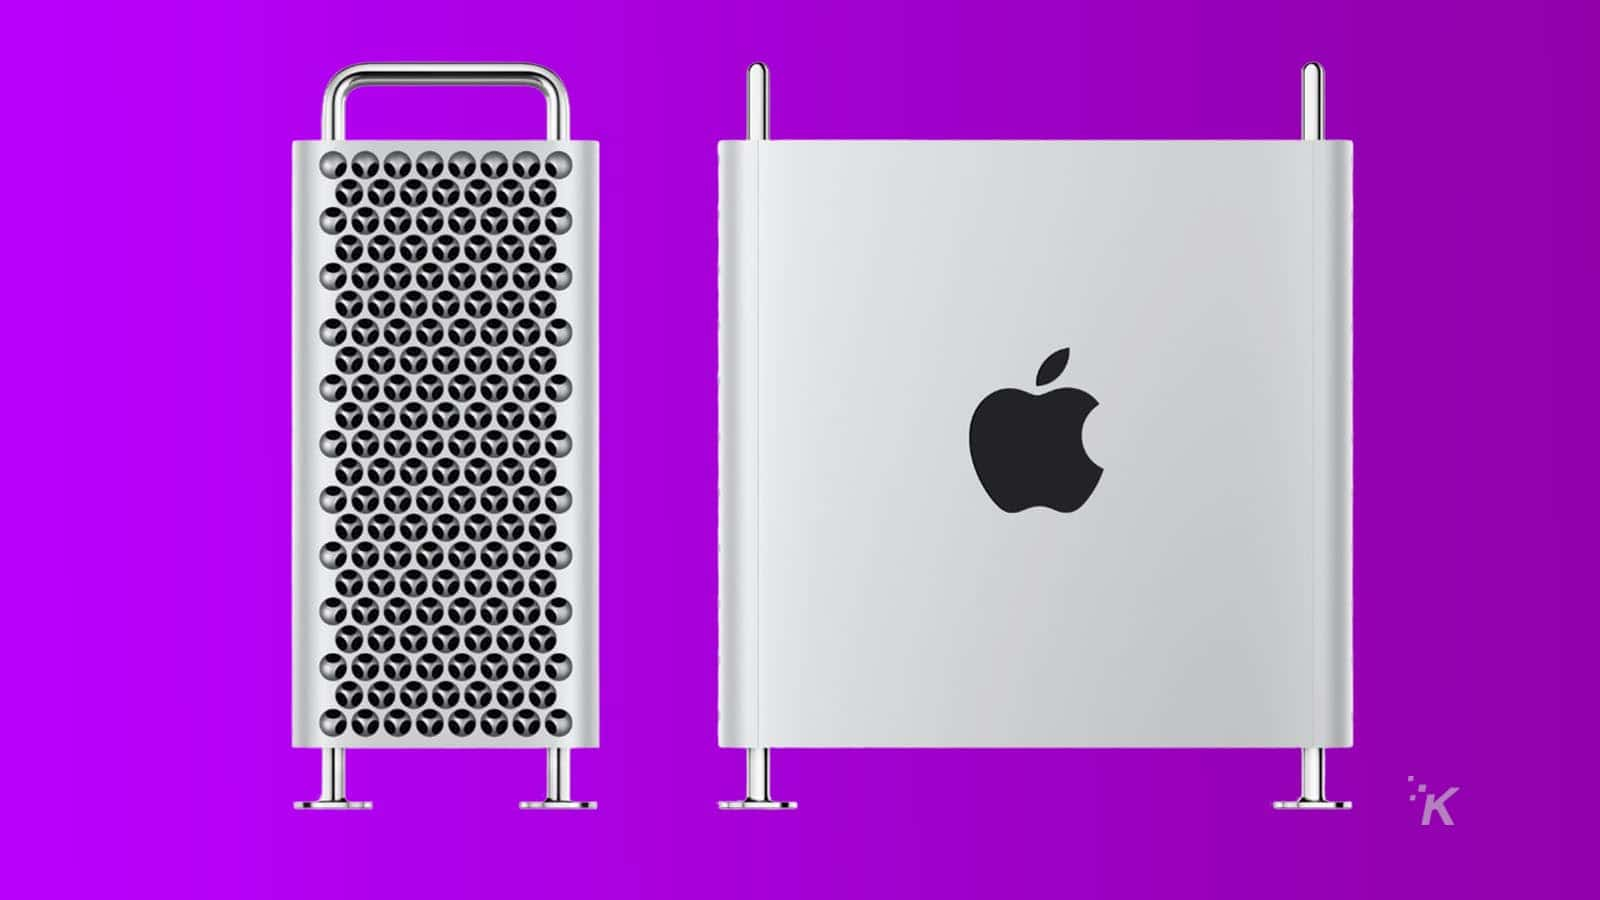 apple mac pro on purple background